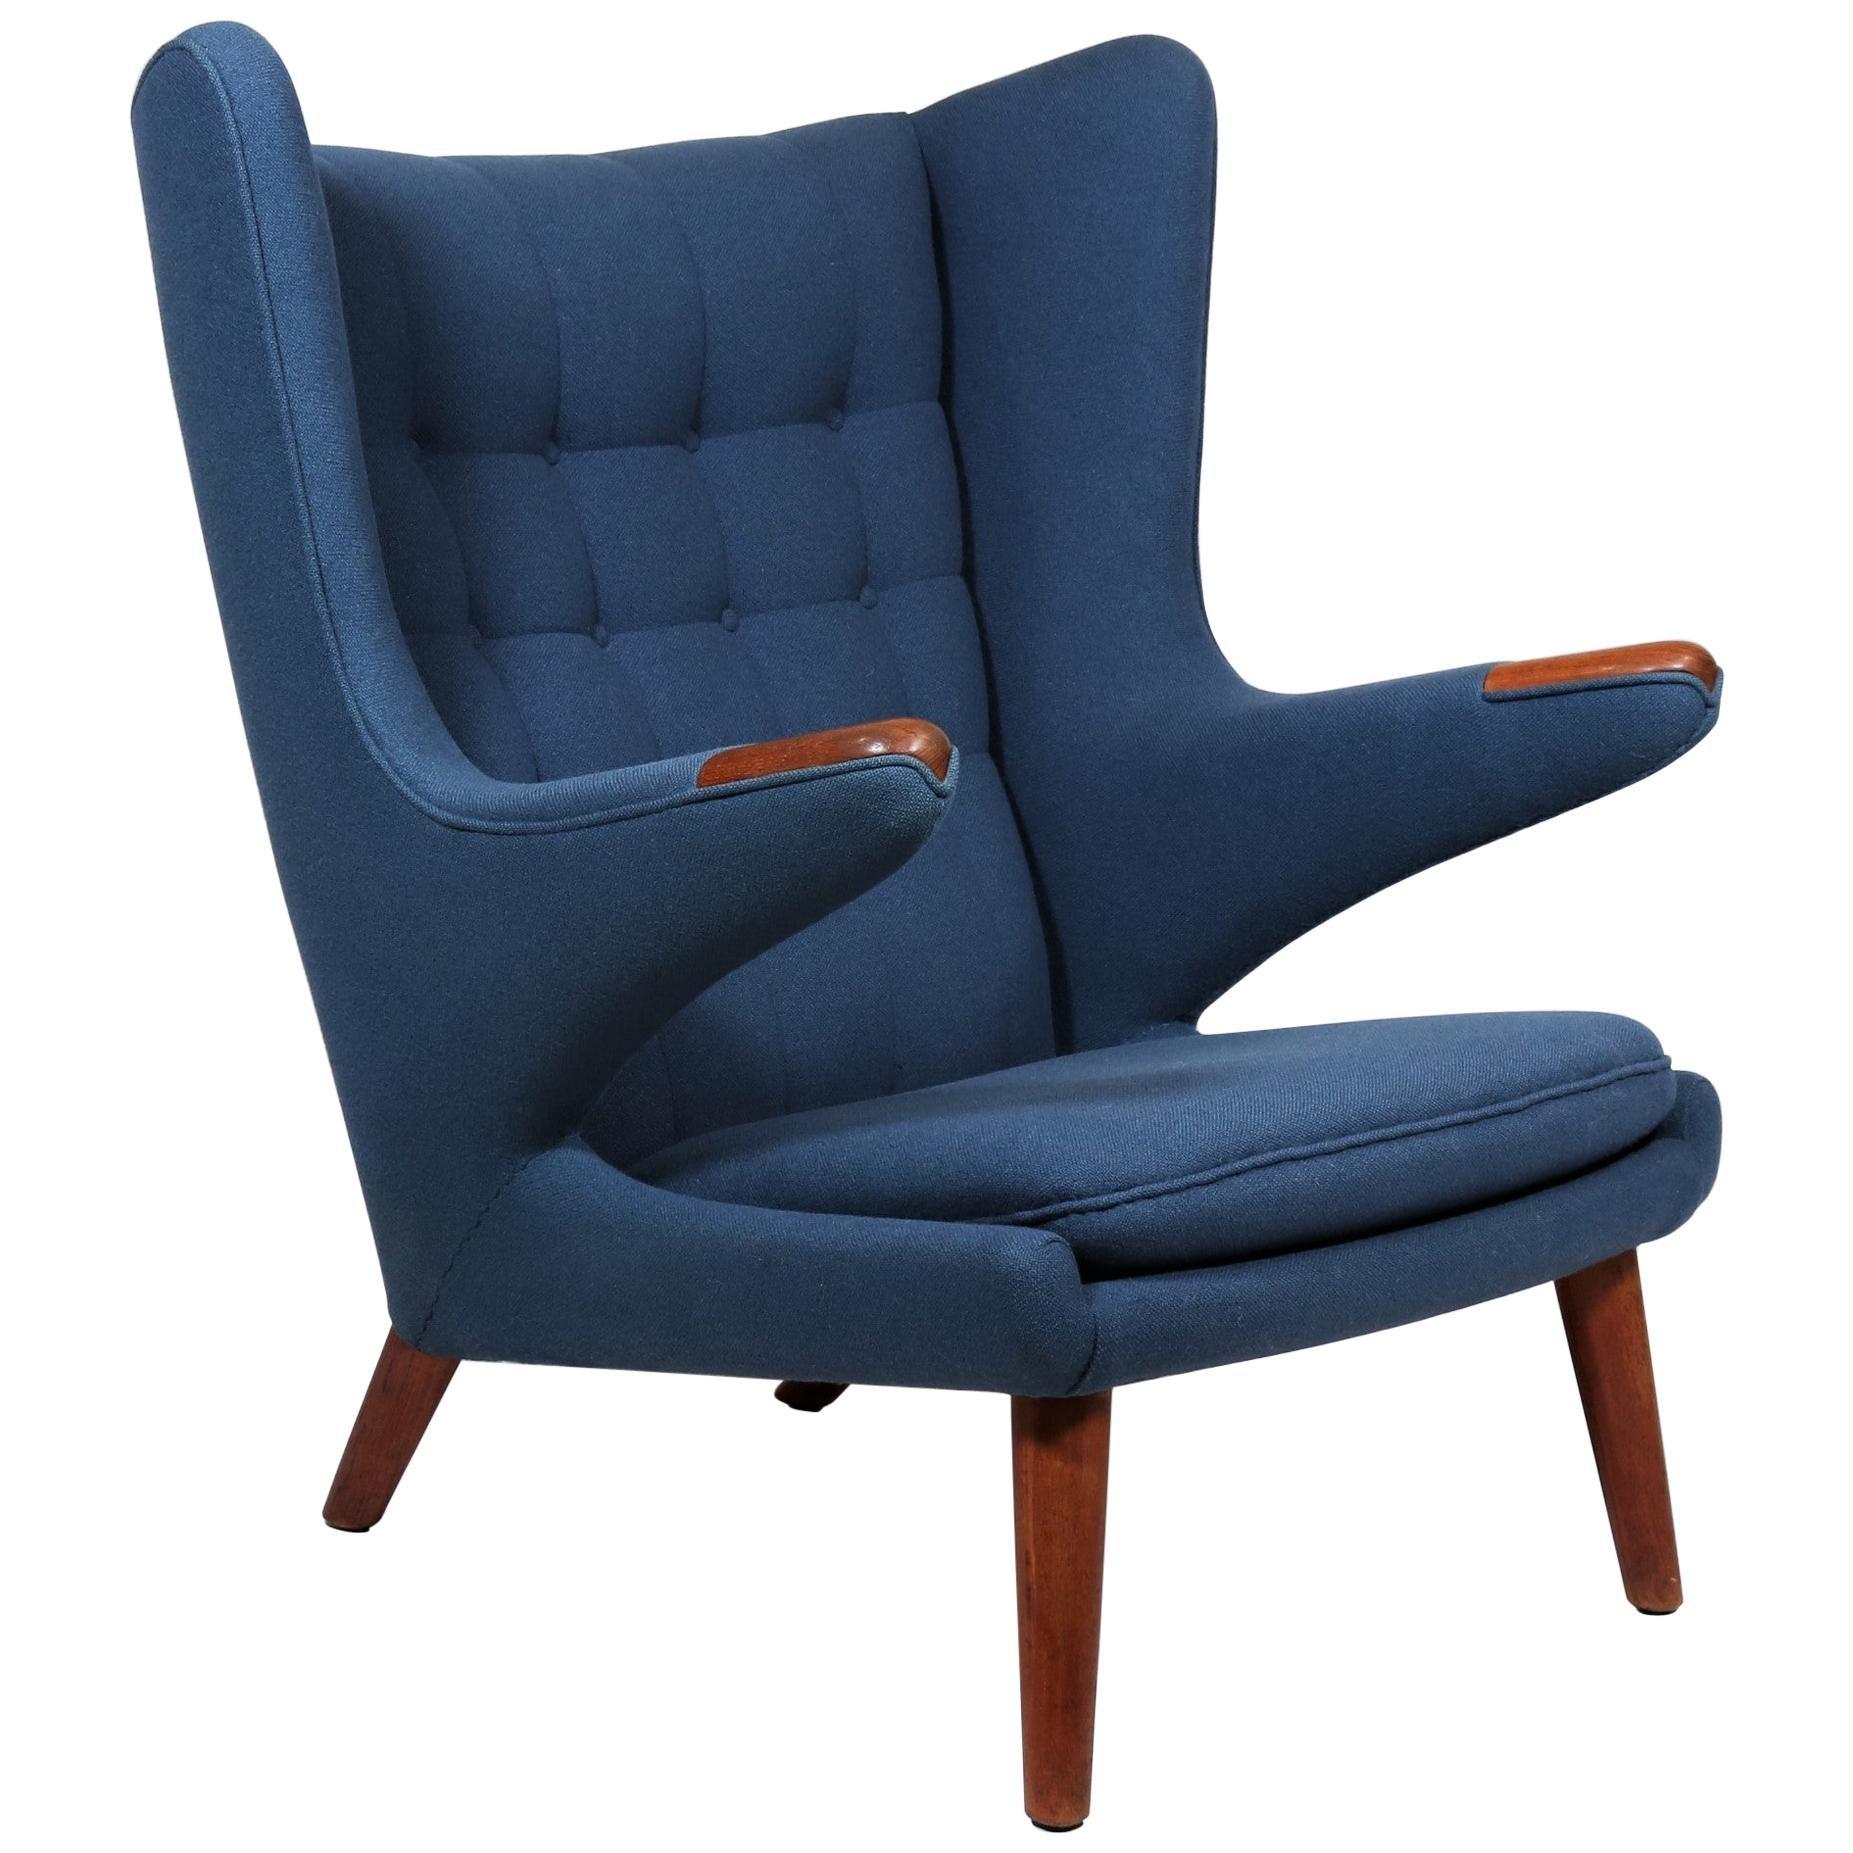 Groovy Antique And Vintage Chairs 20 476 For Sale At 1Stdibs Inzonedesignstudio Interior Chair Design Inzonedesignstudiocom